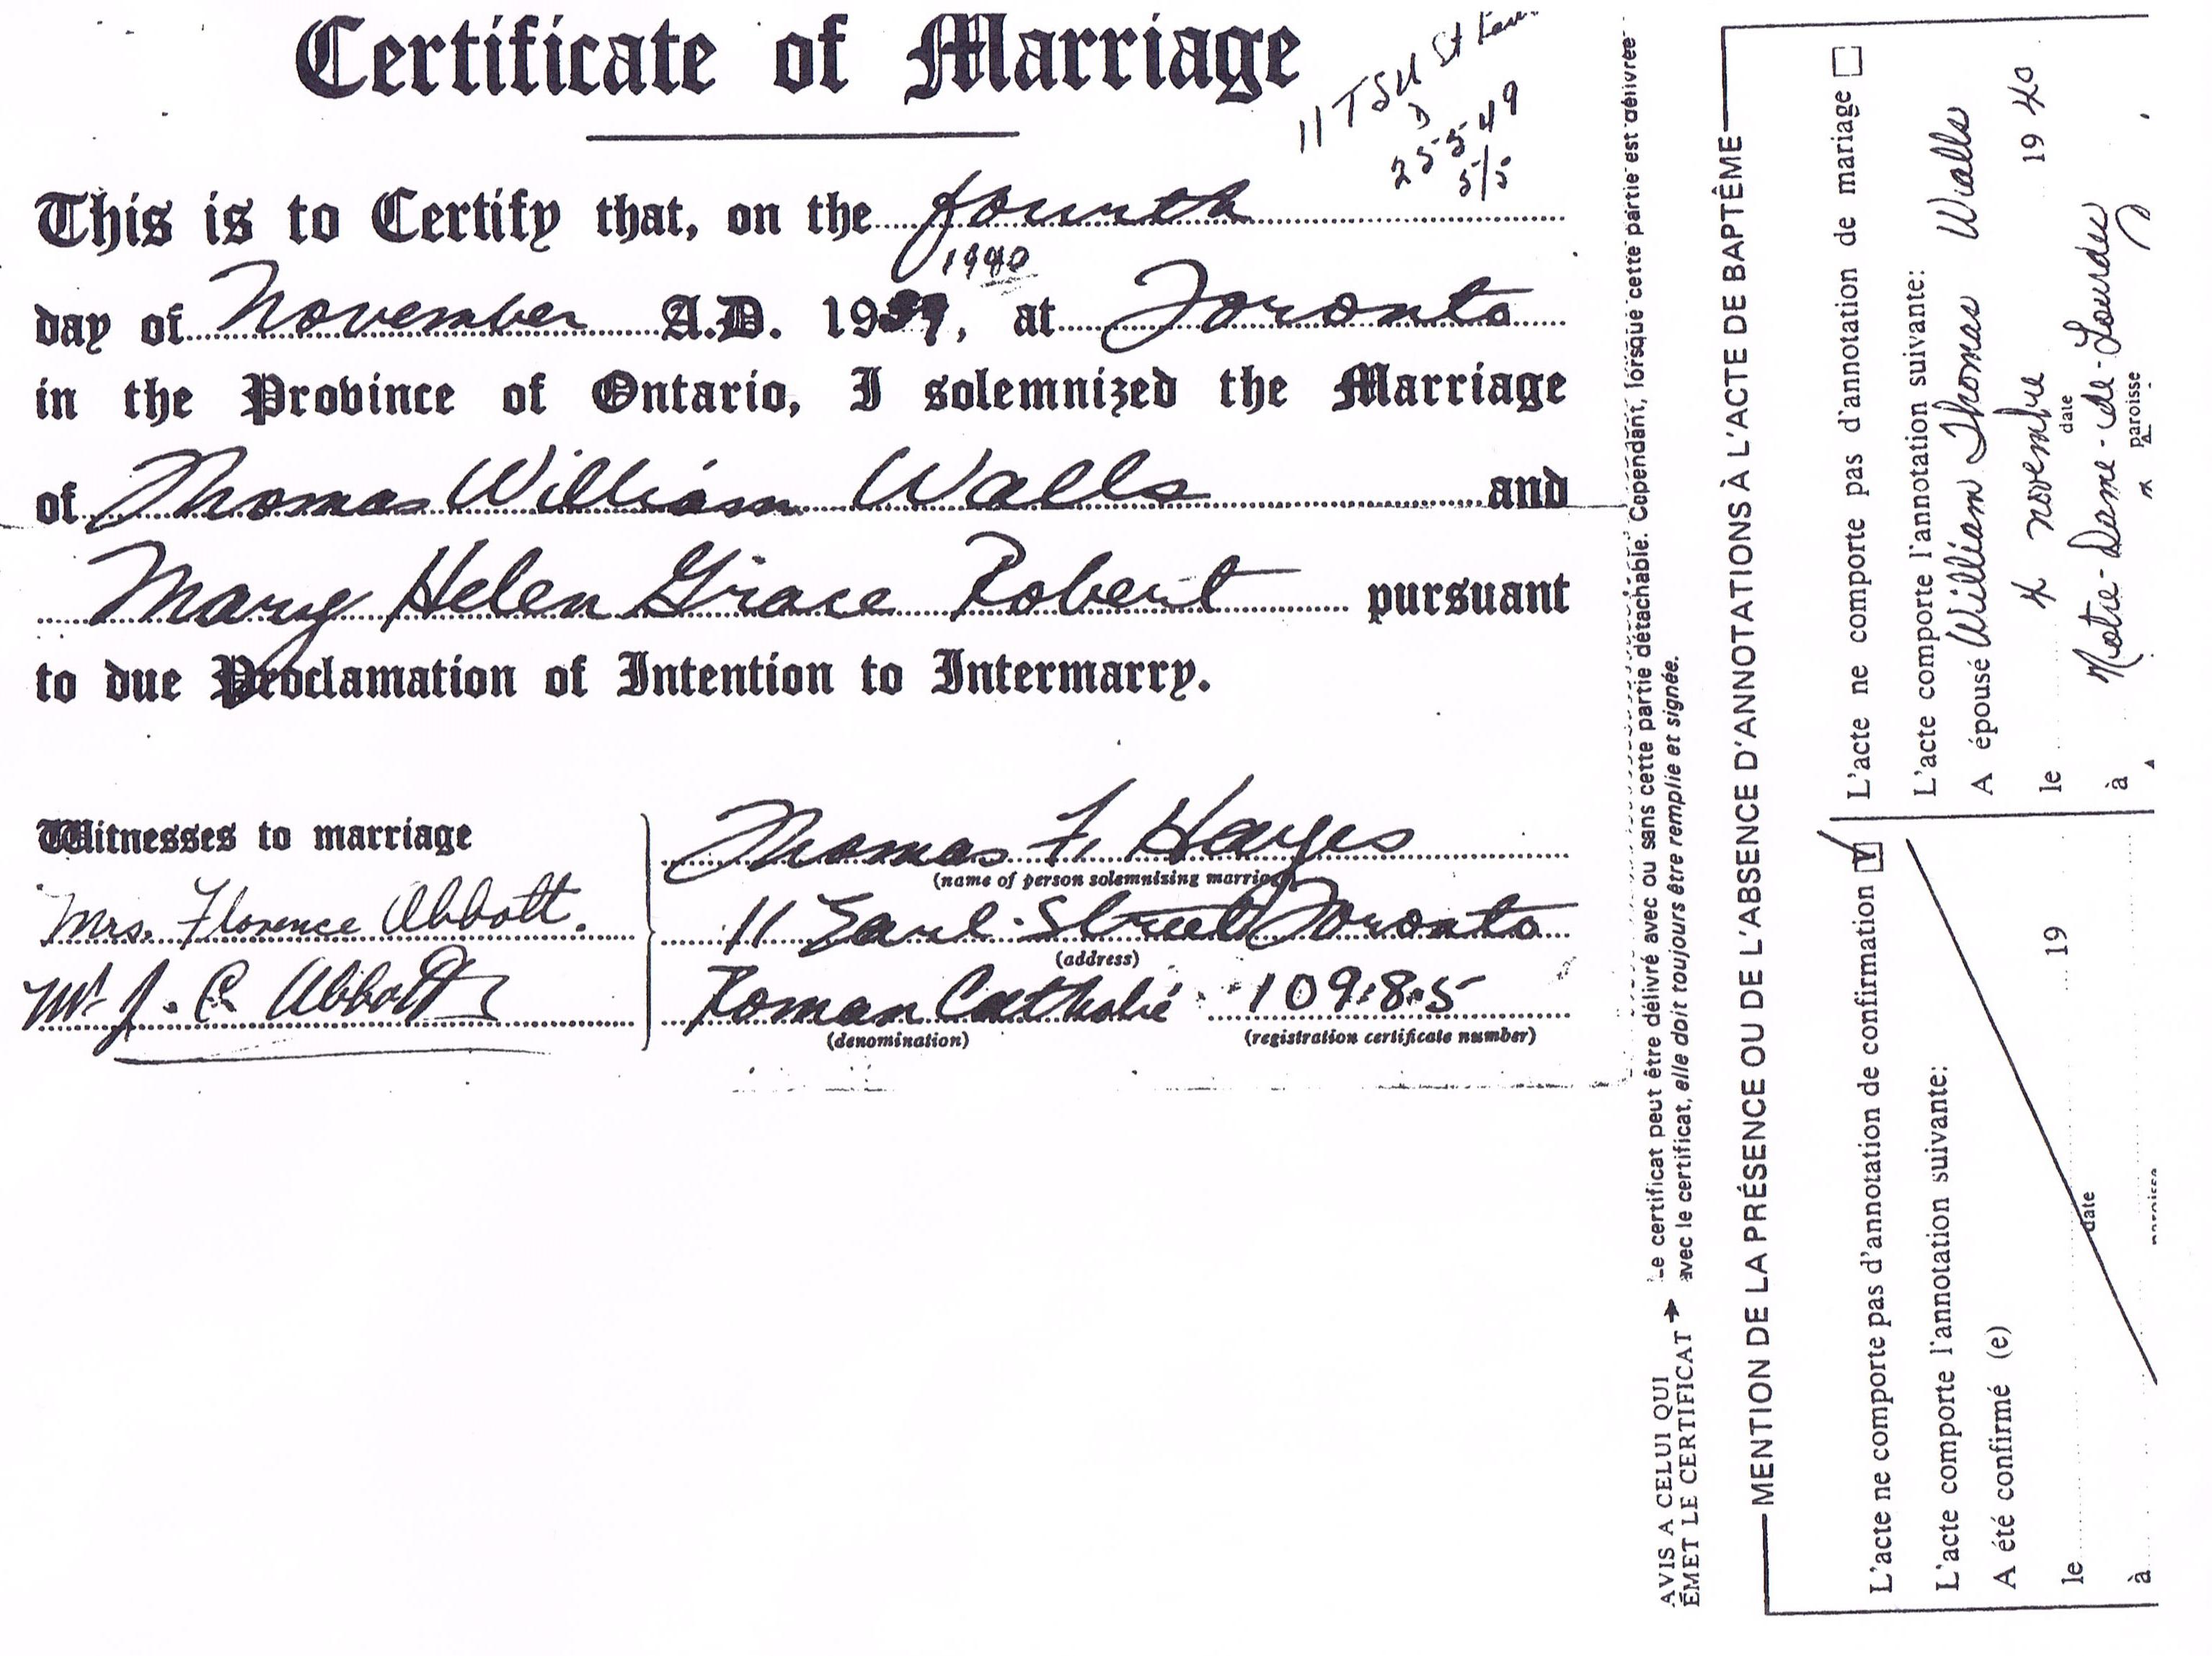 Documents Marriage Certificate 4 Nov 1939 Thomas William Walls Ii